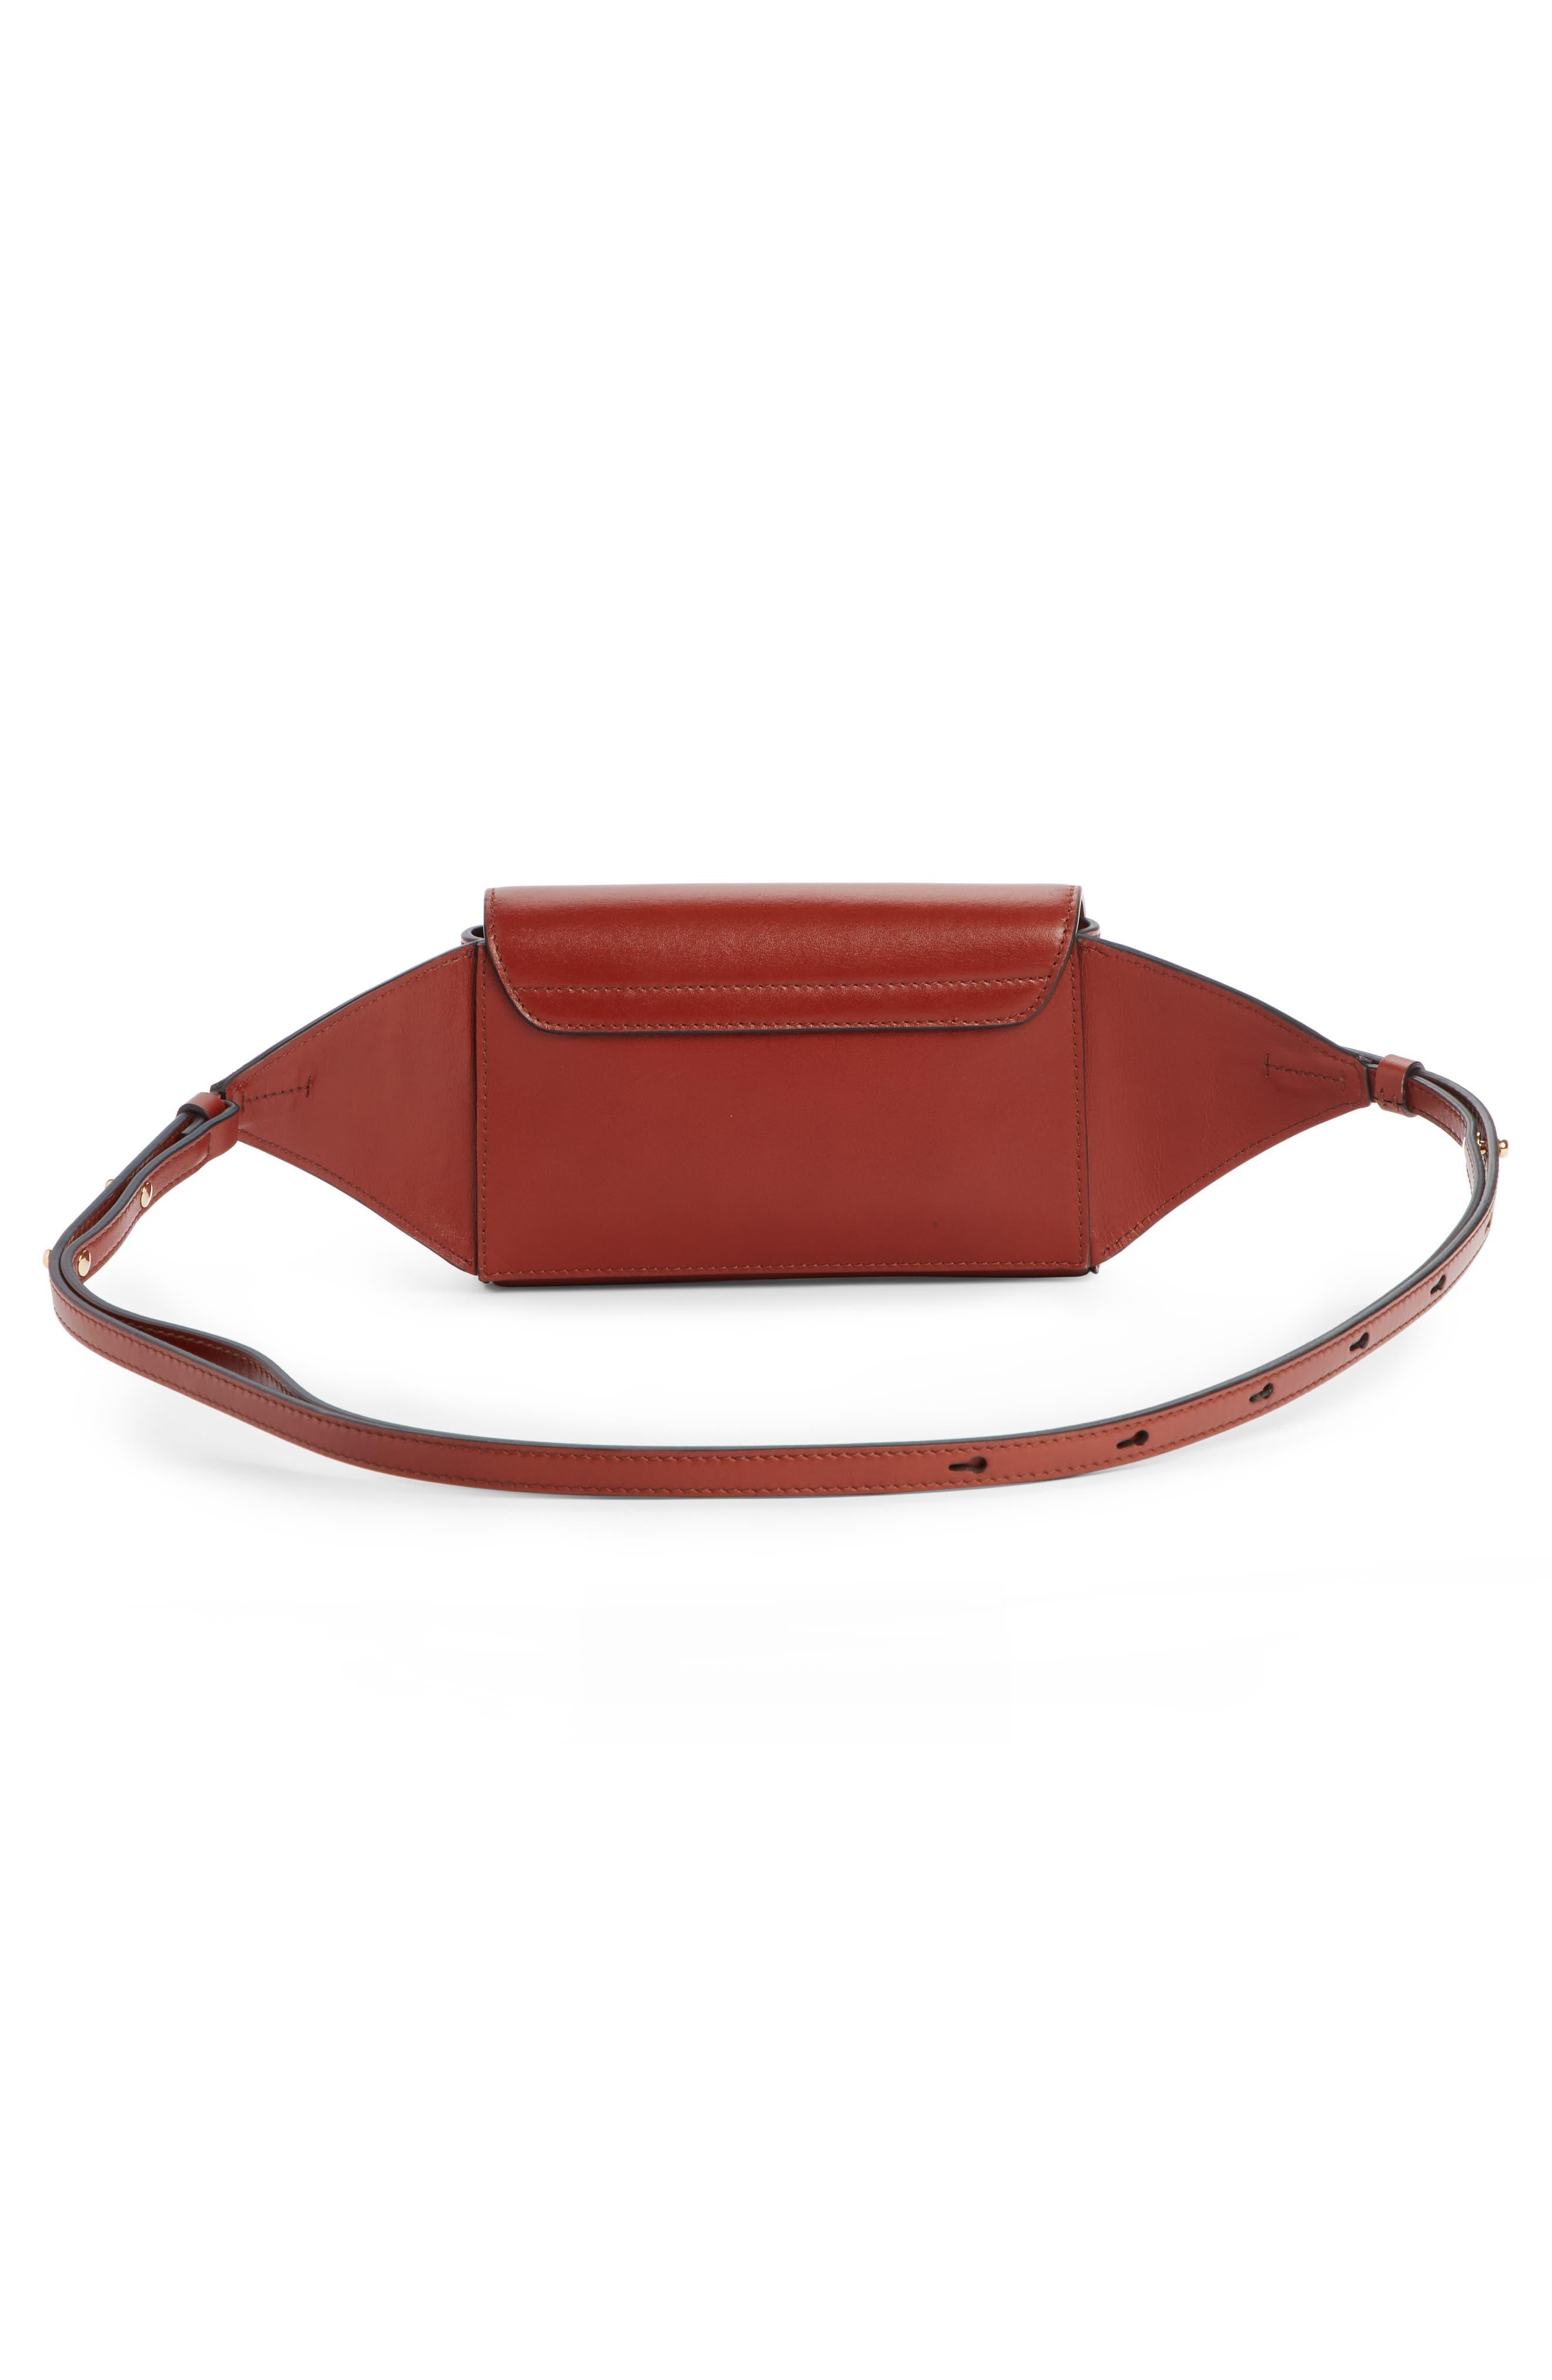 CHLOÉ,                             C Leather Convertible Belt Bag,                             Alternate thumbnail 3, color,                             SEPIA BROWN